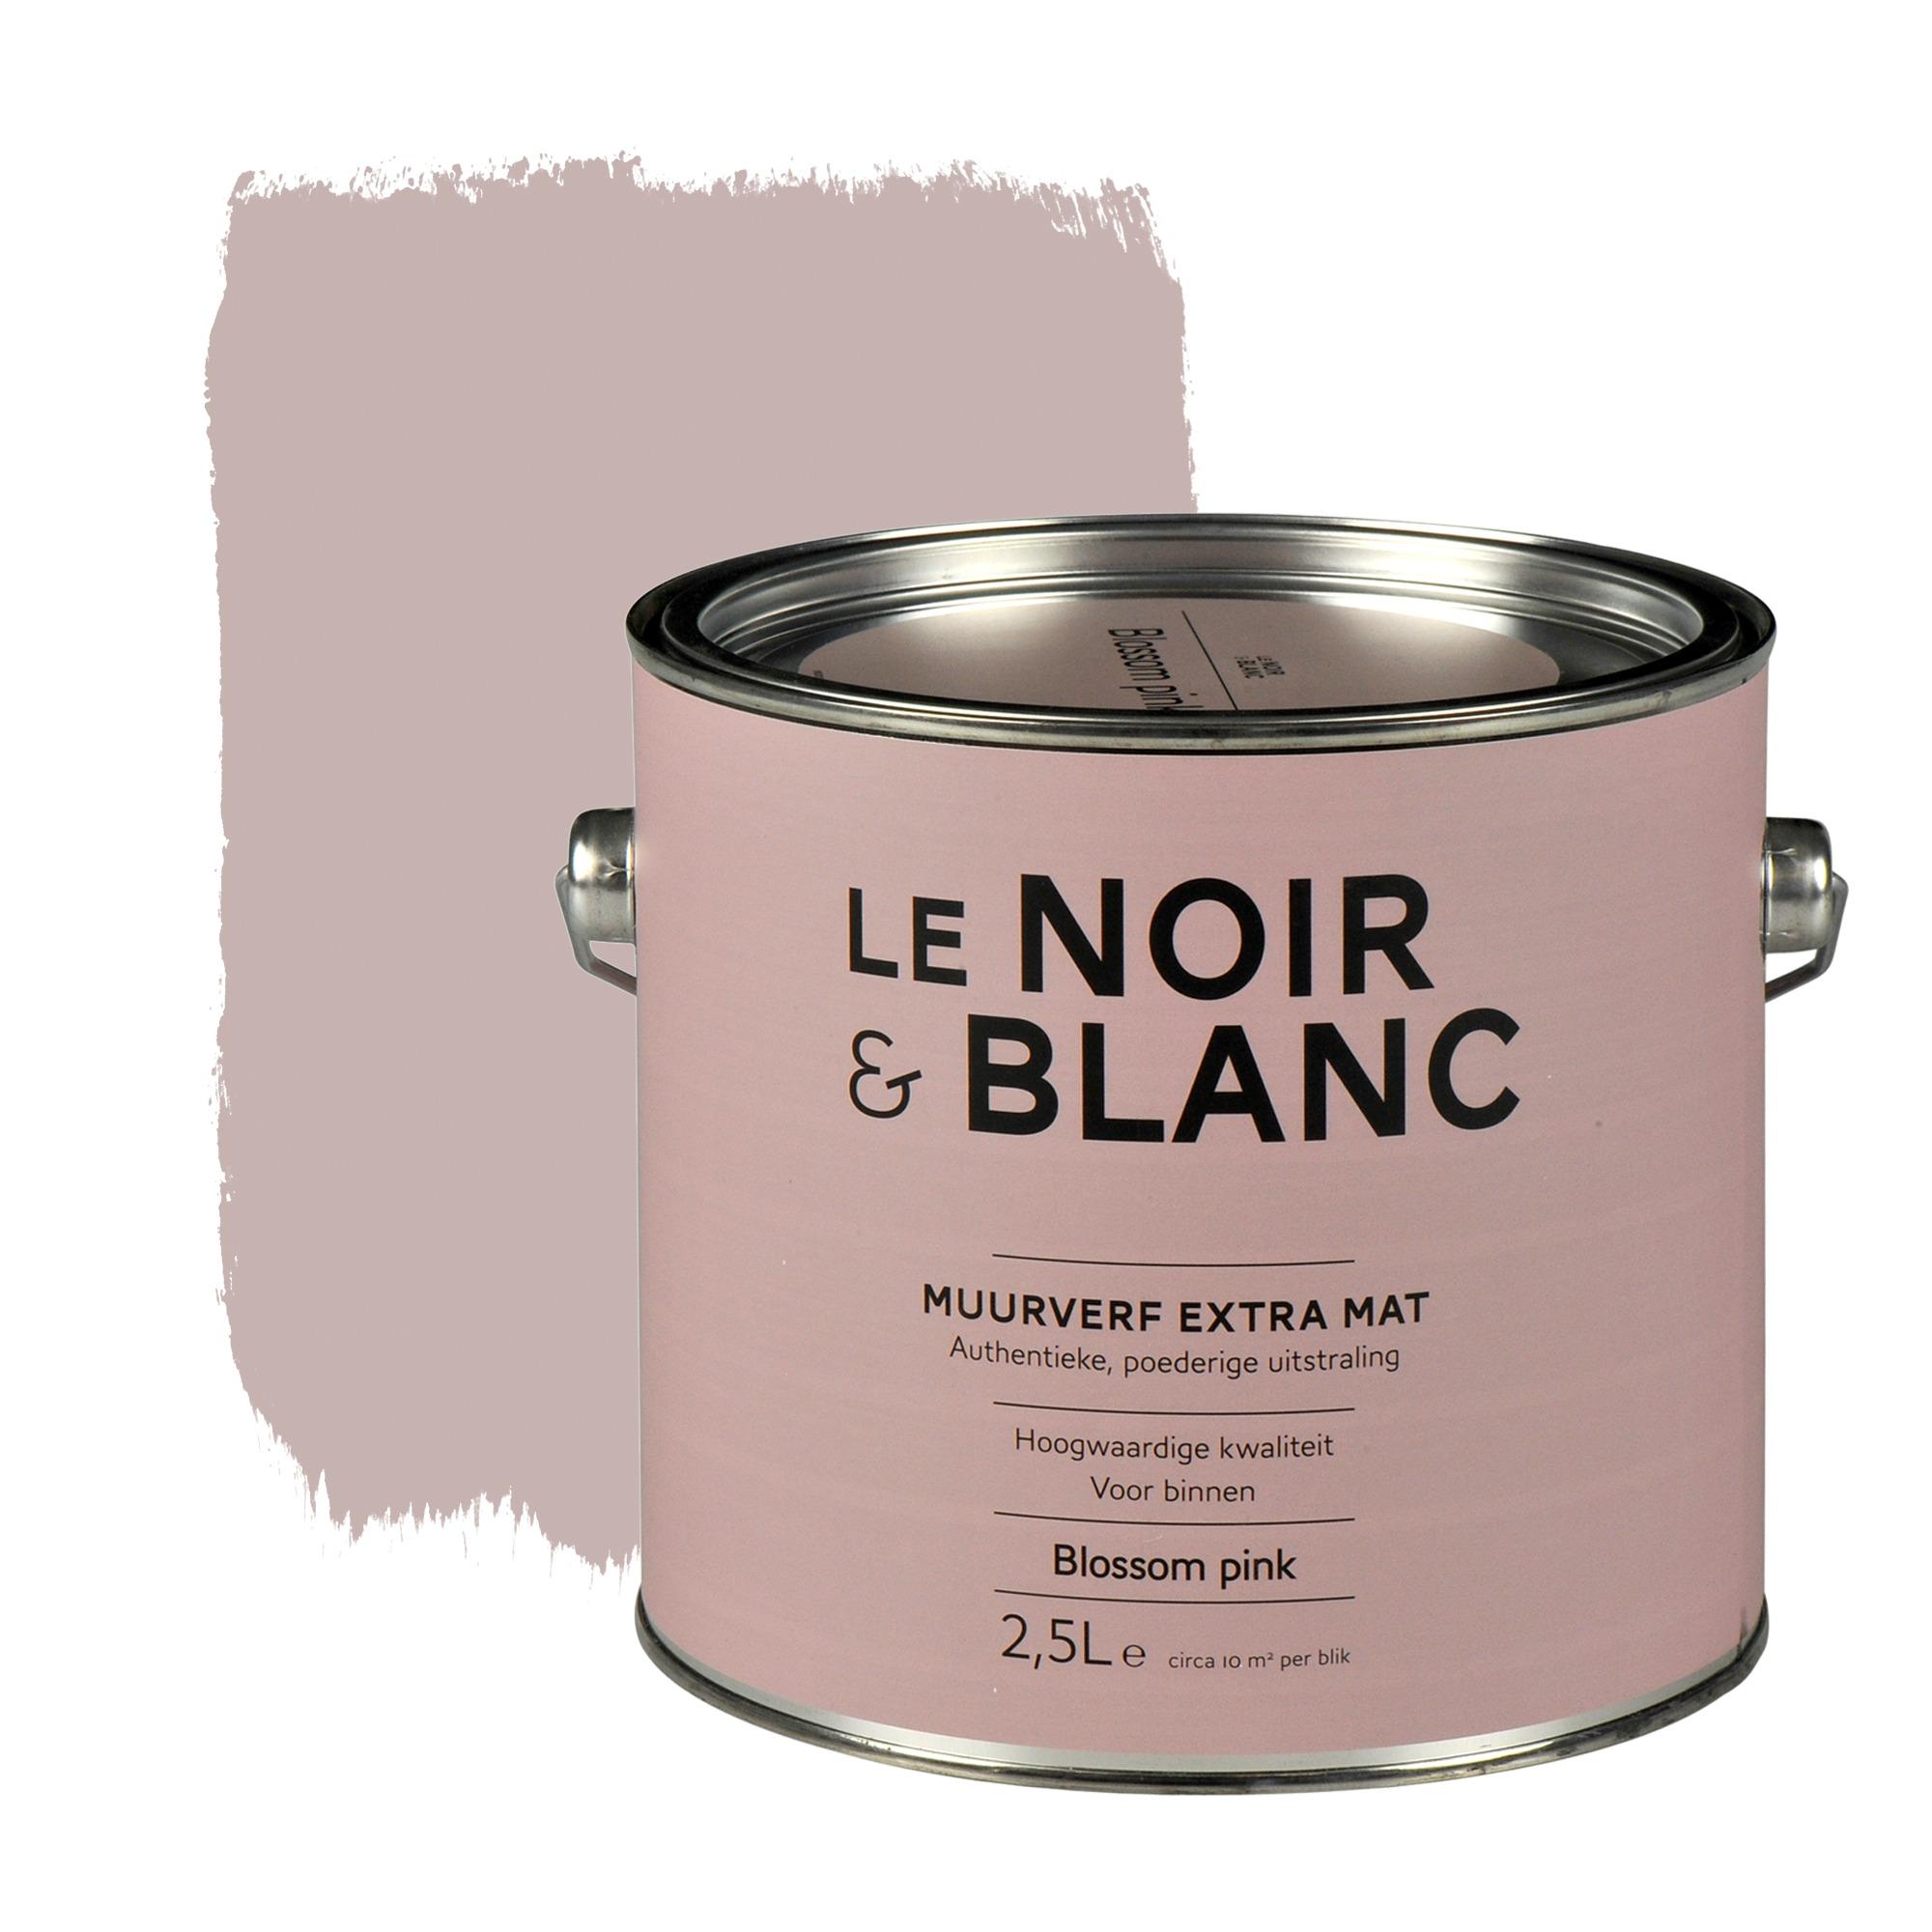 Photo of Le Noir & Blanc muurverf extra mat blossem pink 2,5 l kopen?  muurverf-kleur | Karwei